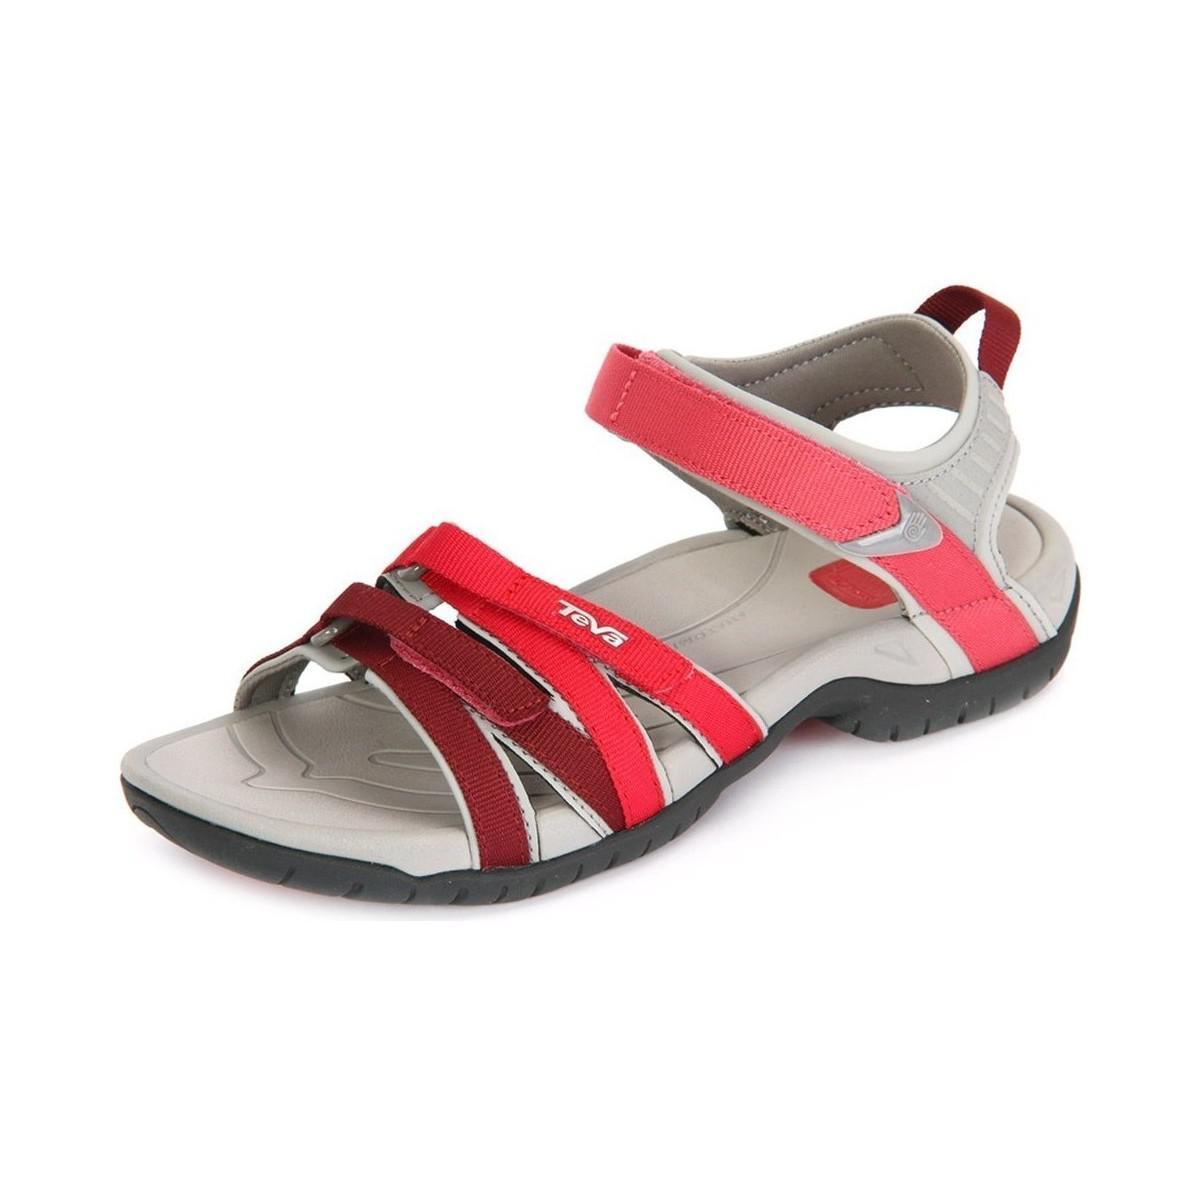 0b17d97f584c Teva Tirra Ws Red Gradient Textil Women s Sandals In Multicolour in ...